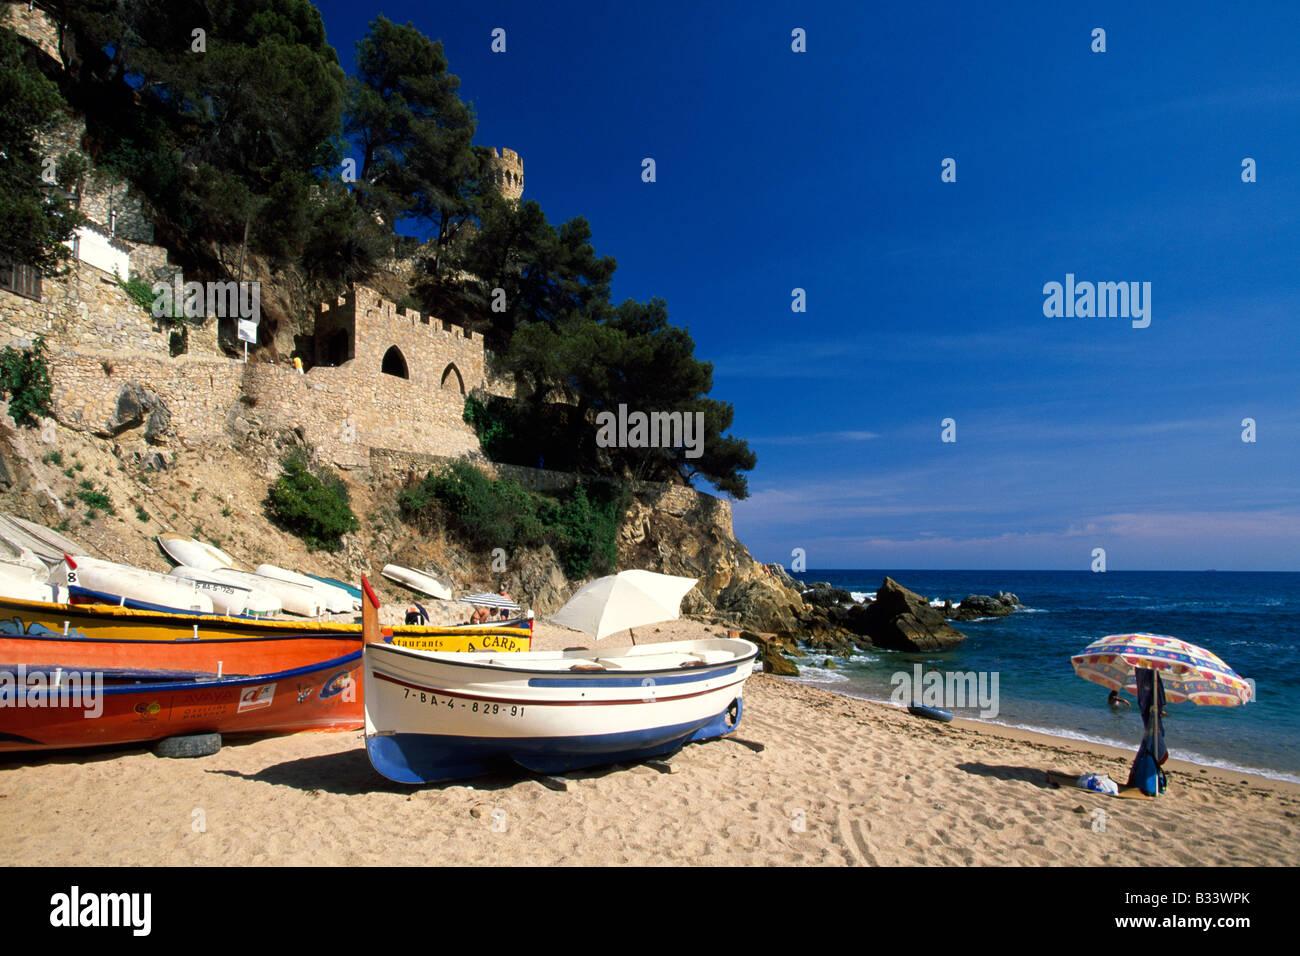 Lloret de Mar Costa Brava Cataluña España Imagen De Stock